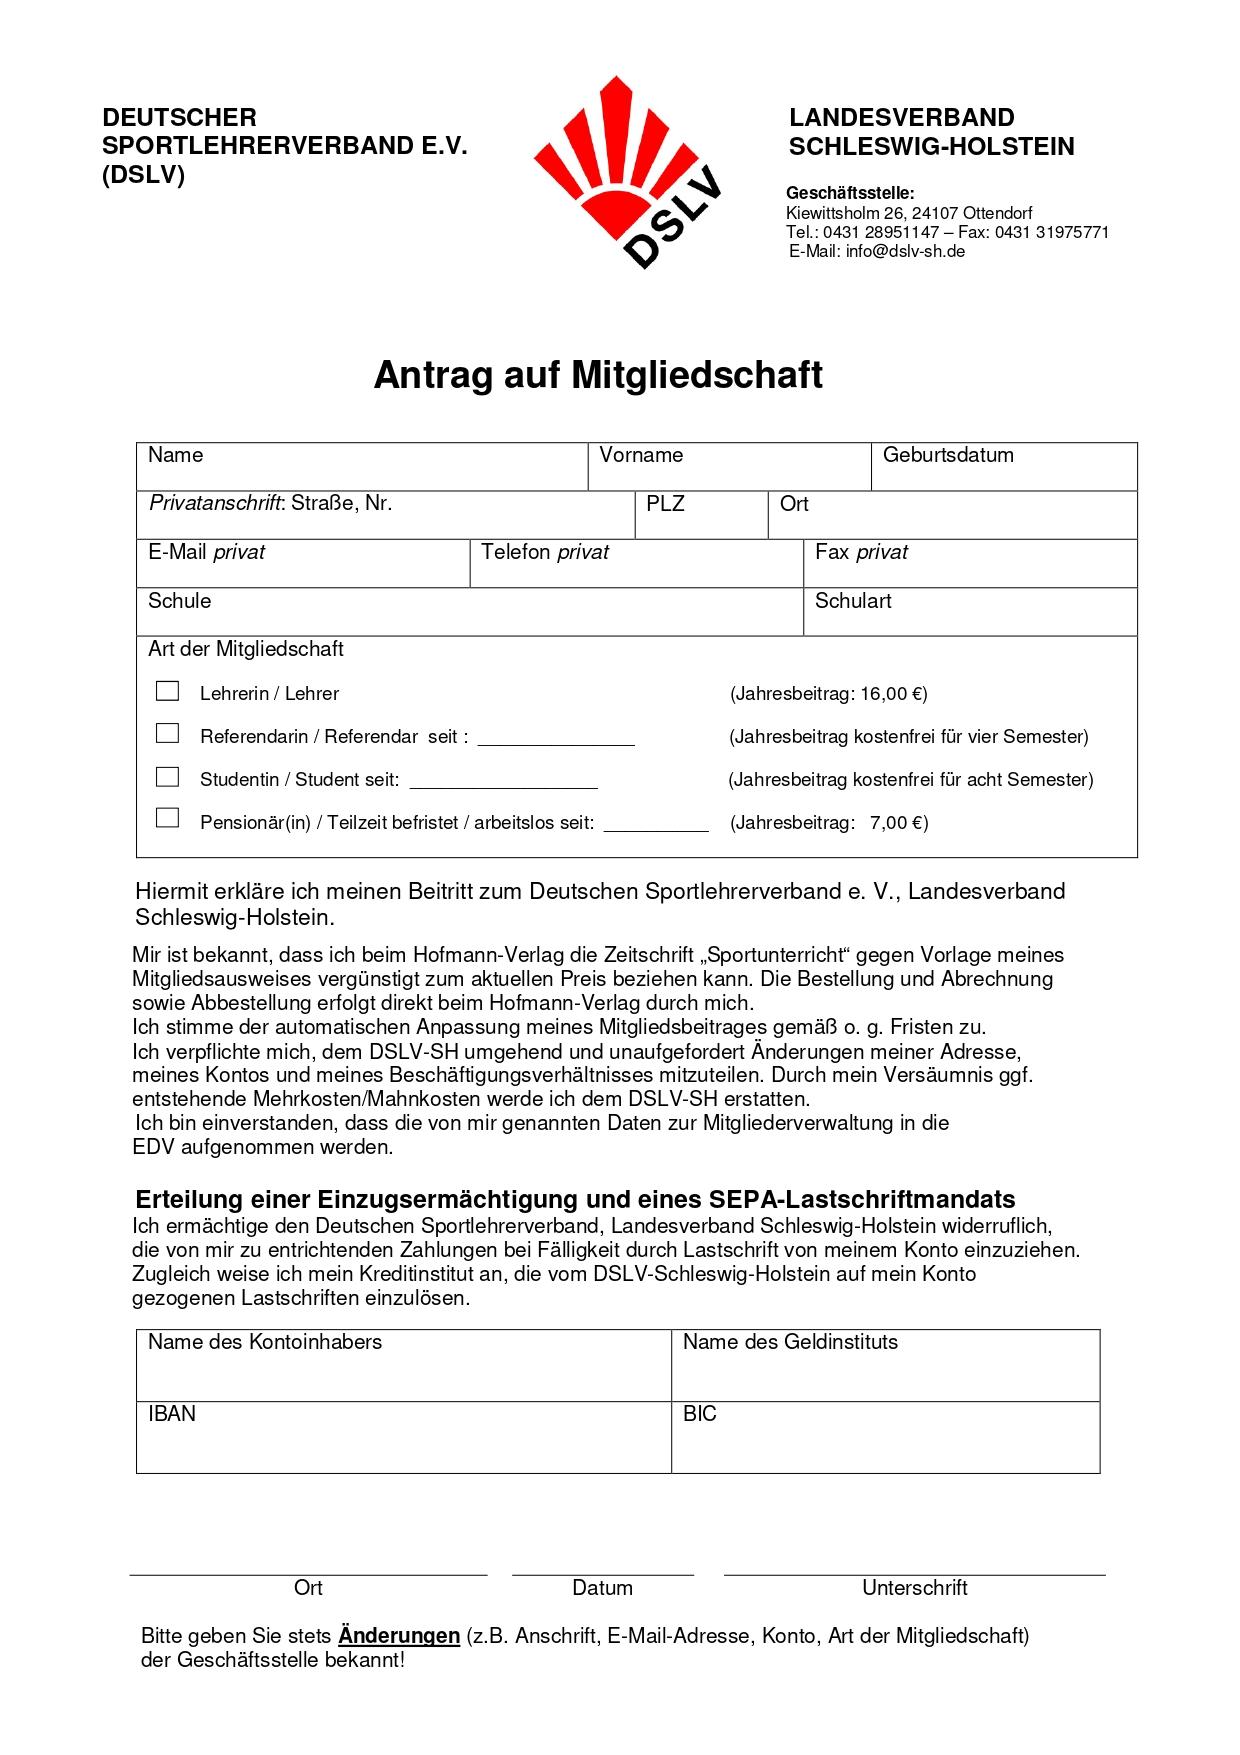 Mitgliedschaftsantrag DSLV Landesverband Hamburg